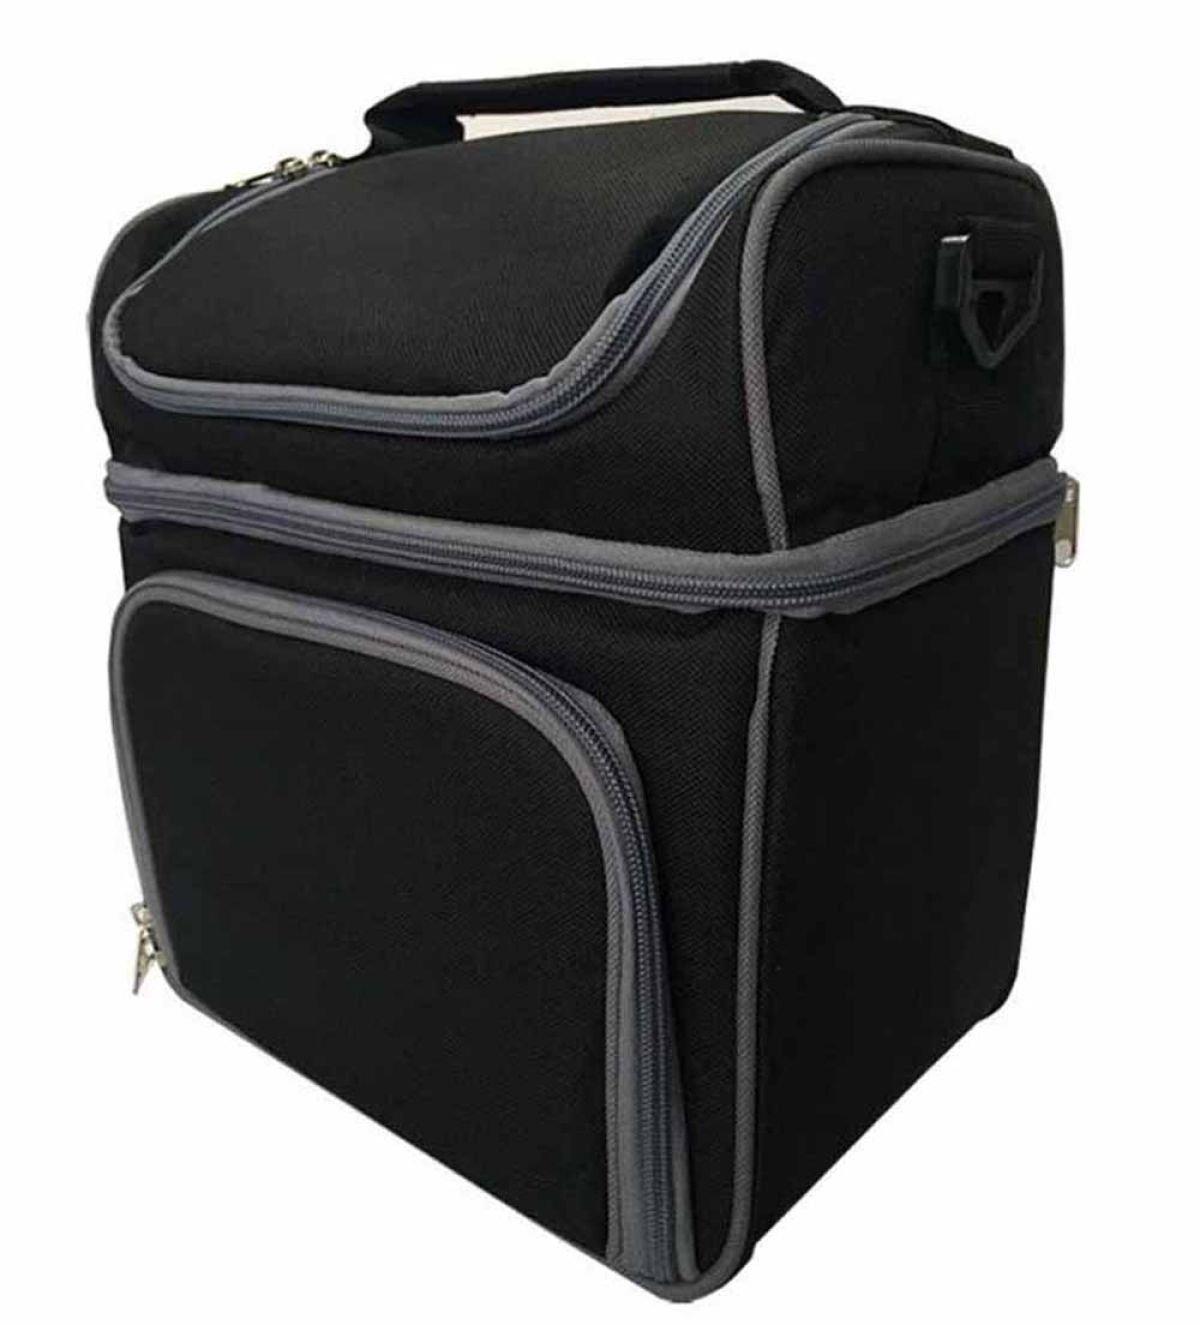 Outdoor-Picknick-Kühltasche Kühltasche Kühltasche Tragbar Handtasche